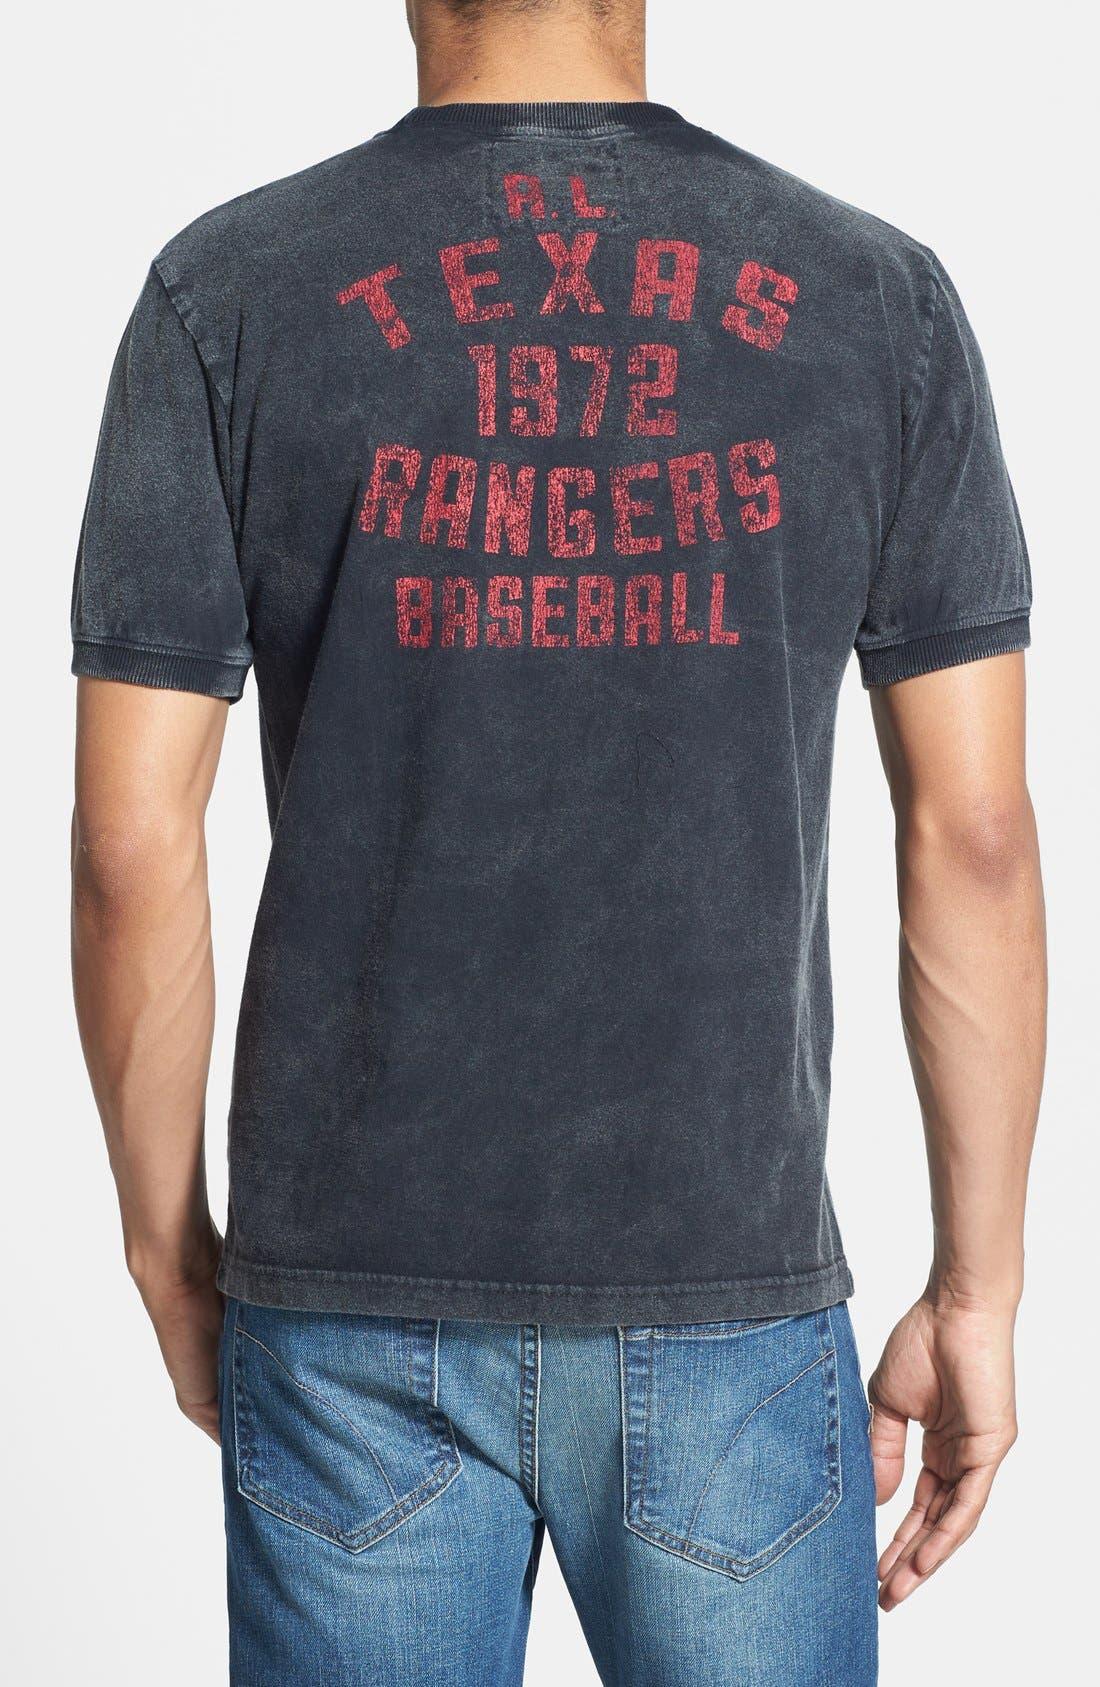 Alternate Image 2  - Red Jacket 'Texas Rangers' Trim Fit T-Shirt